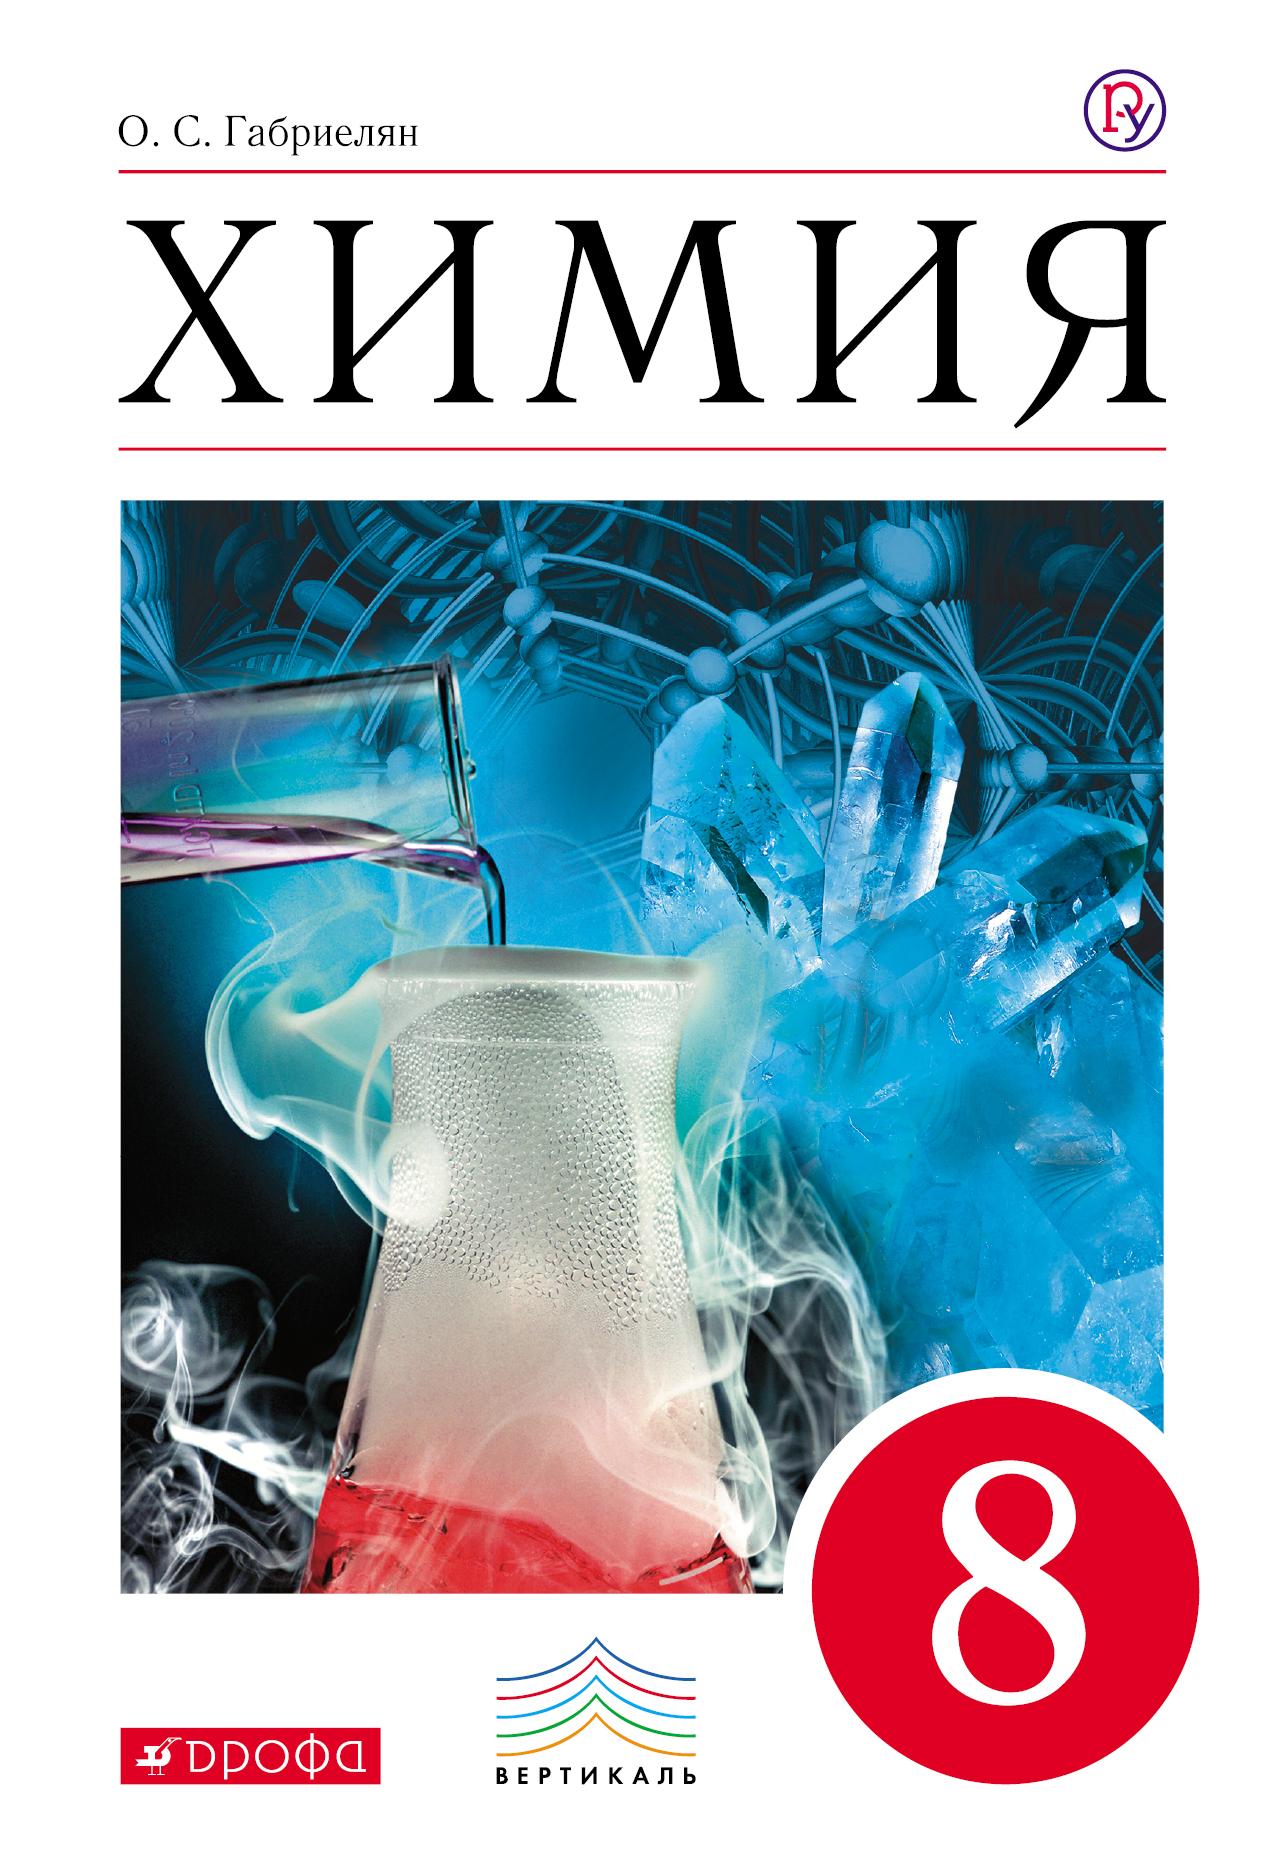 цена на Габриелян О.С. Химия. 8 класс. Учебник